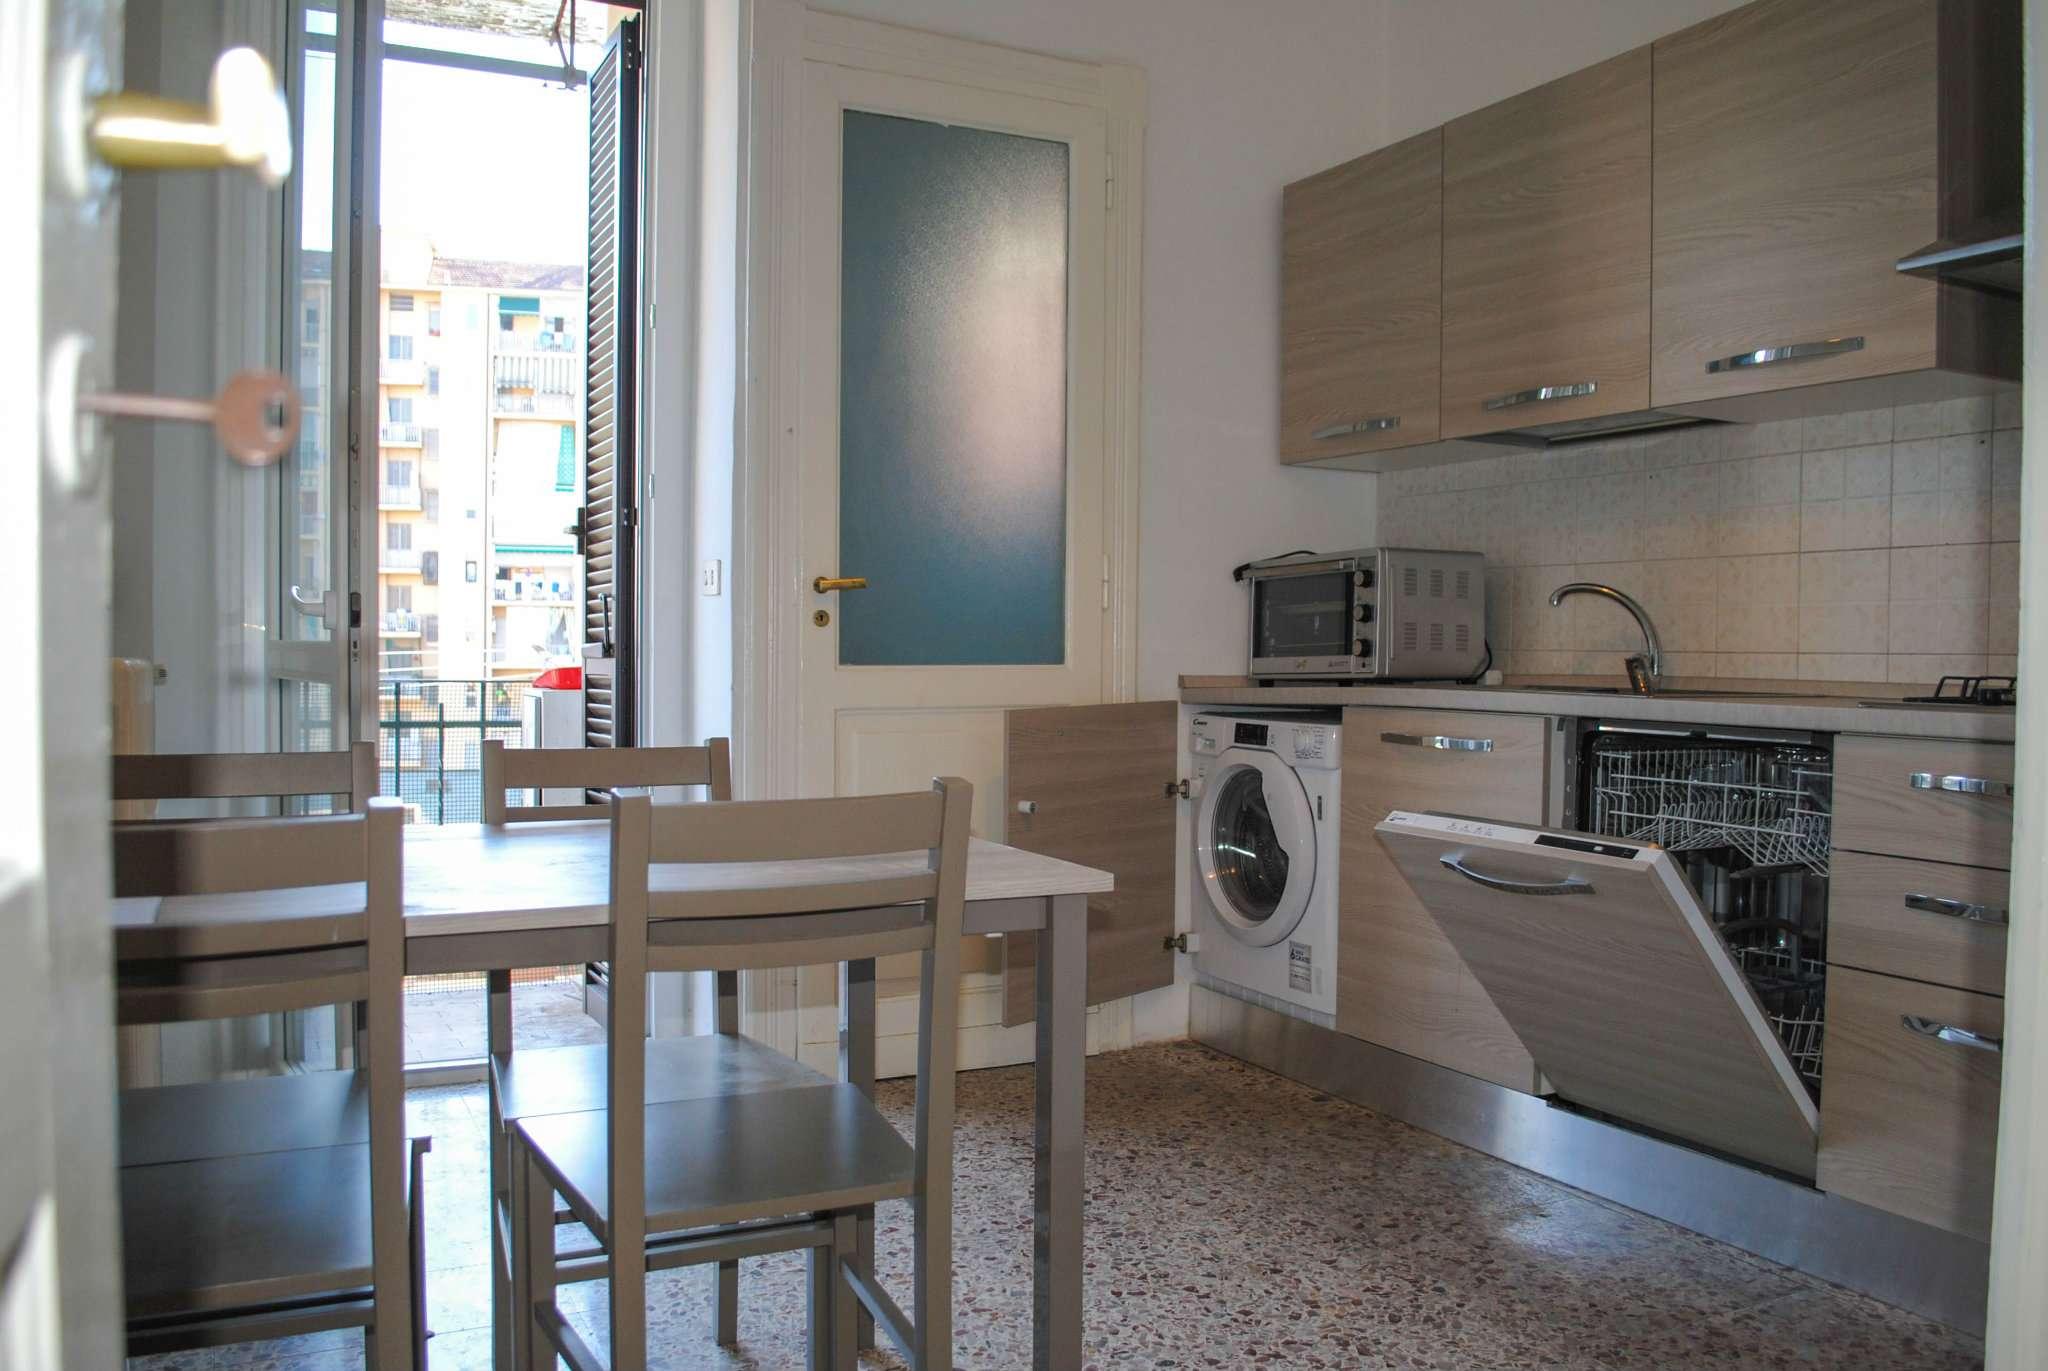 Torino Torino Affitto APPARTAMENTO » vendita alloggio torino vendite appartamenti